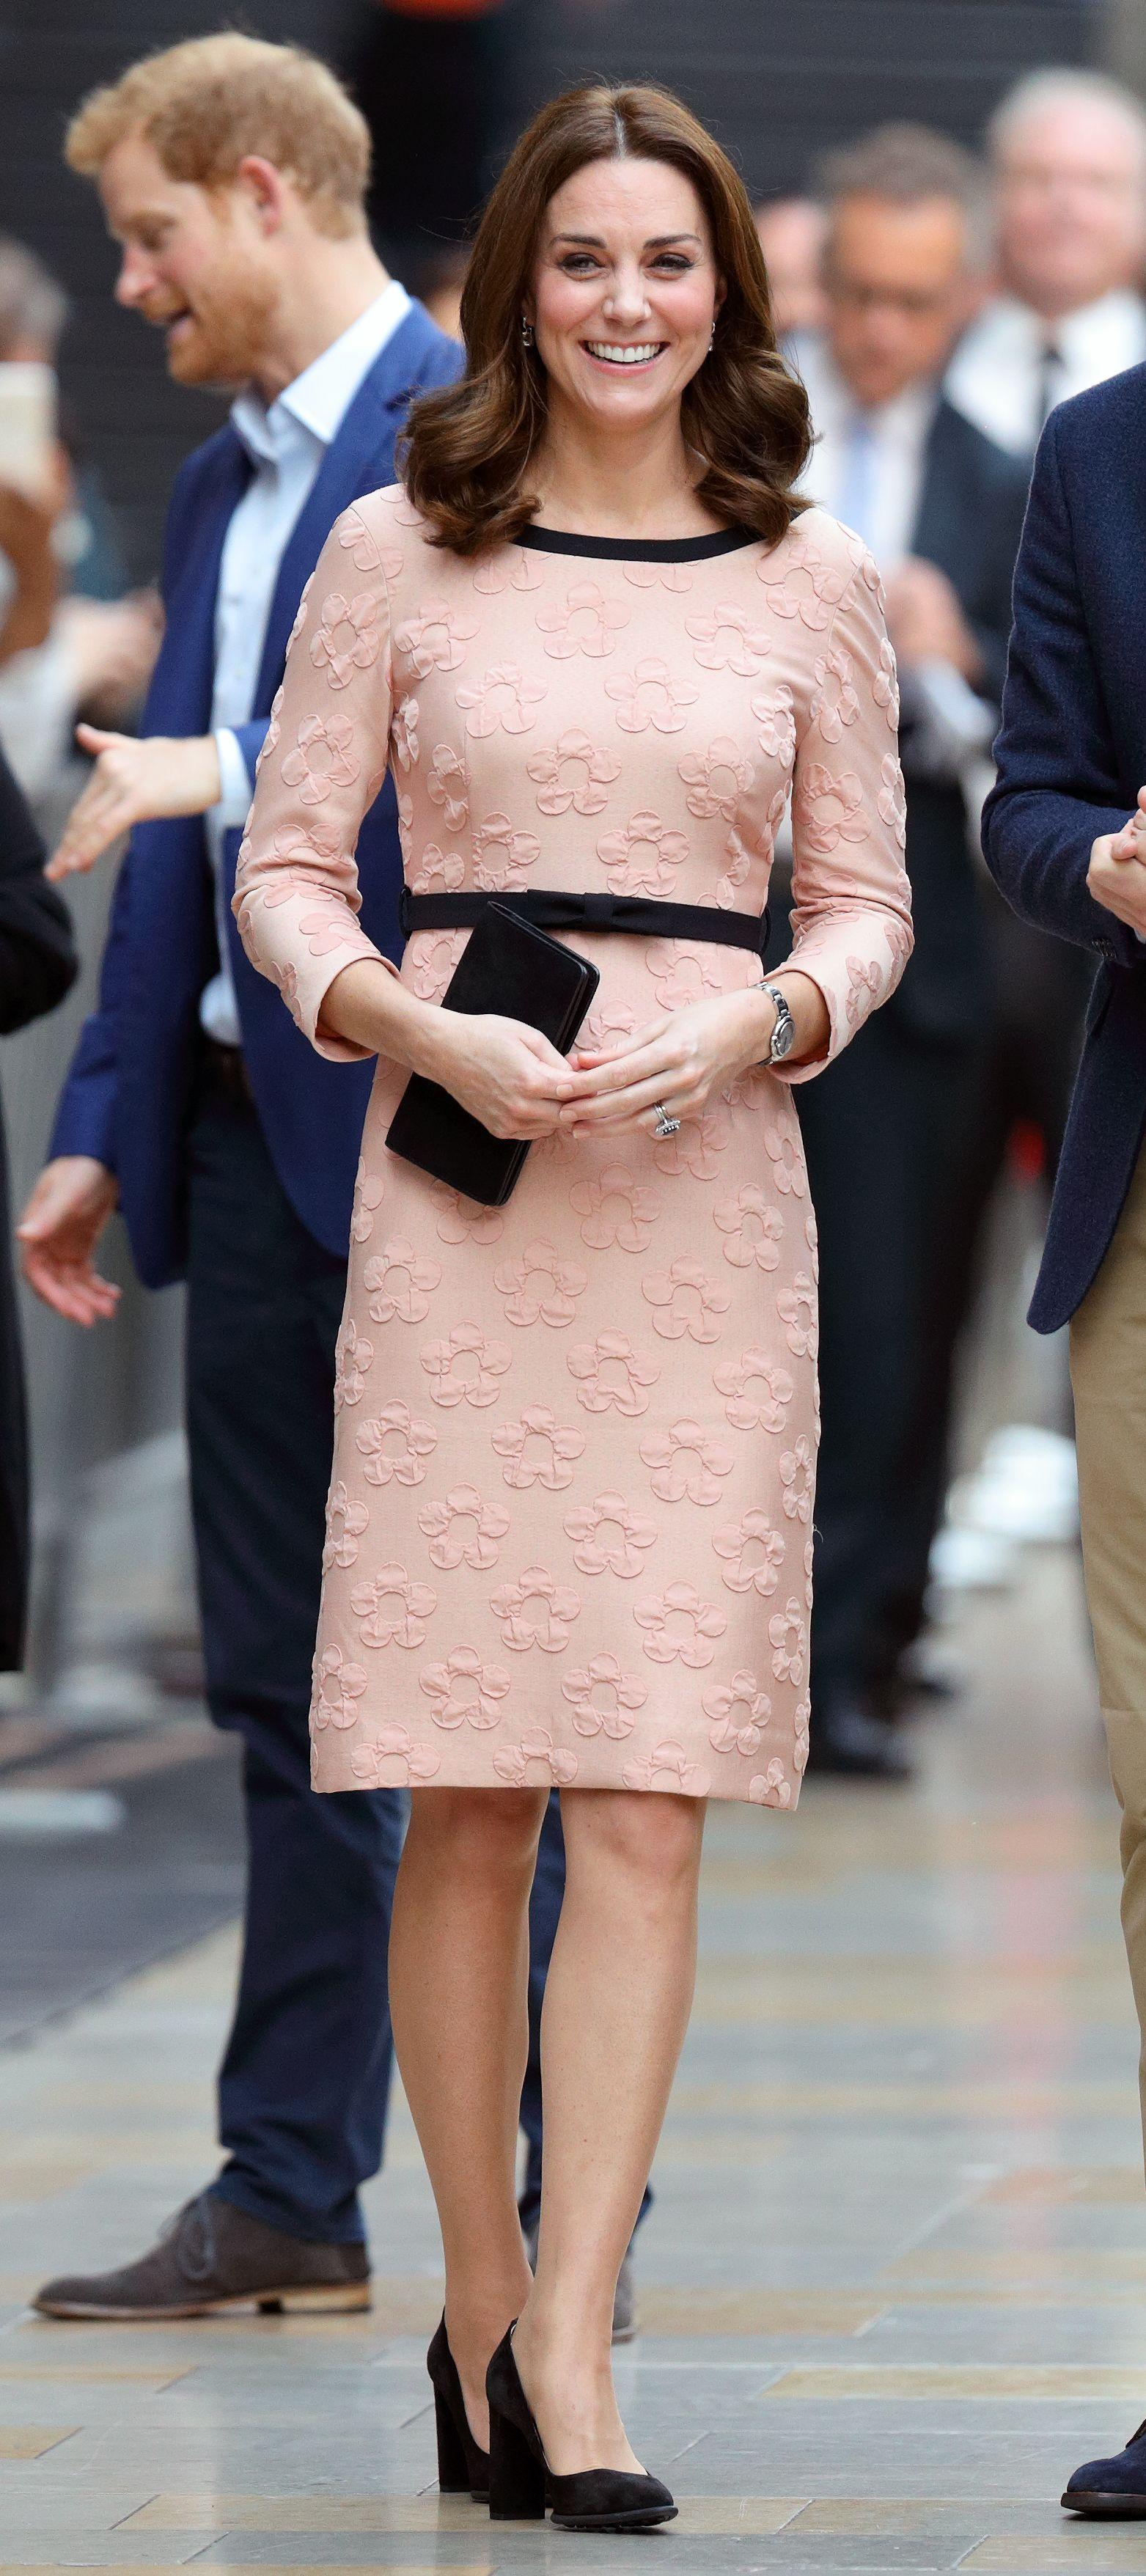 aa83e1ead379e2 Kate Middleton's Most Expensive Outfits of 2017 - Kate Middleton Fashion  2017